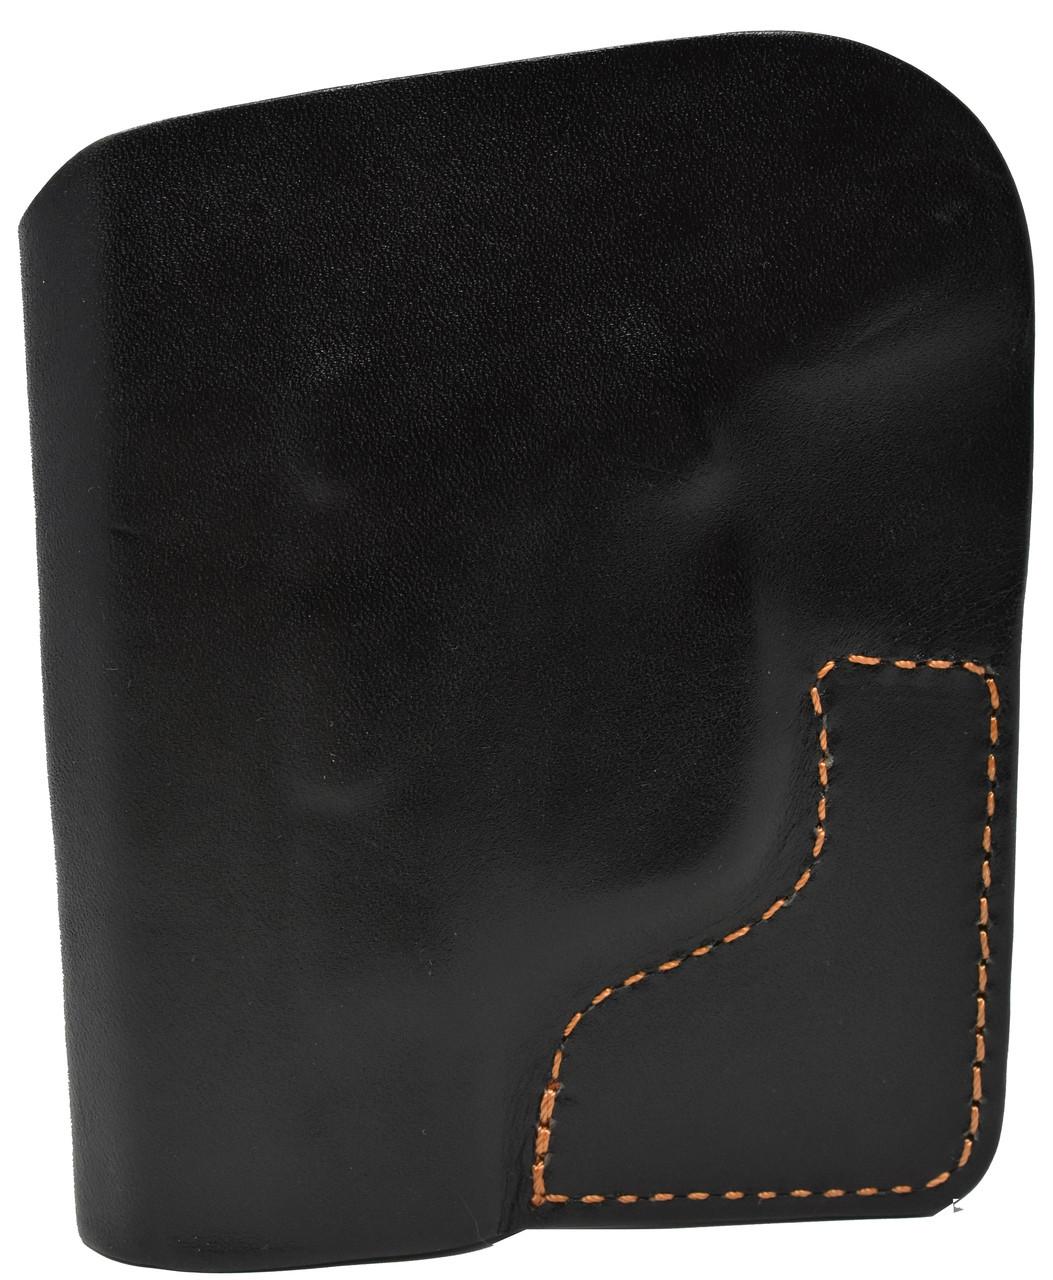 Black Italian Leather Pocket Holster for Kahr P380, CW380 and Similar Guns